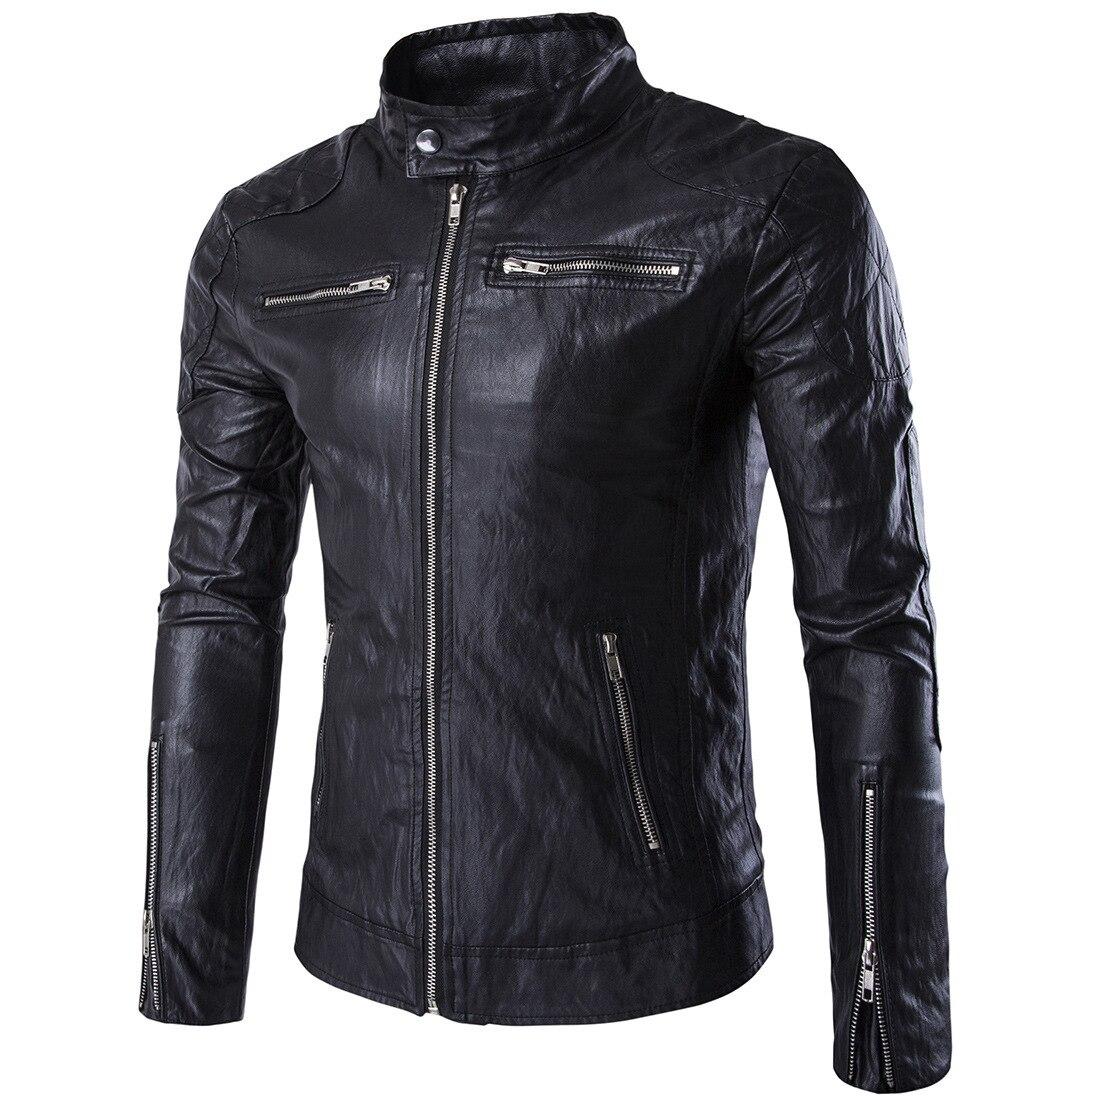 2016 Autumn Men Stand Collar Locomotive Leather Jacket-Style Fashion Man Large Size Leather Jacket Coat Men'S Wear